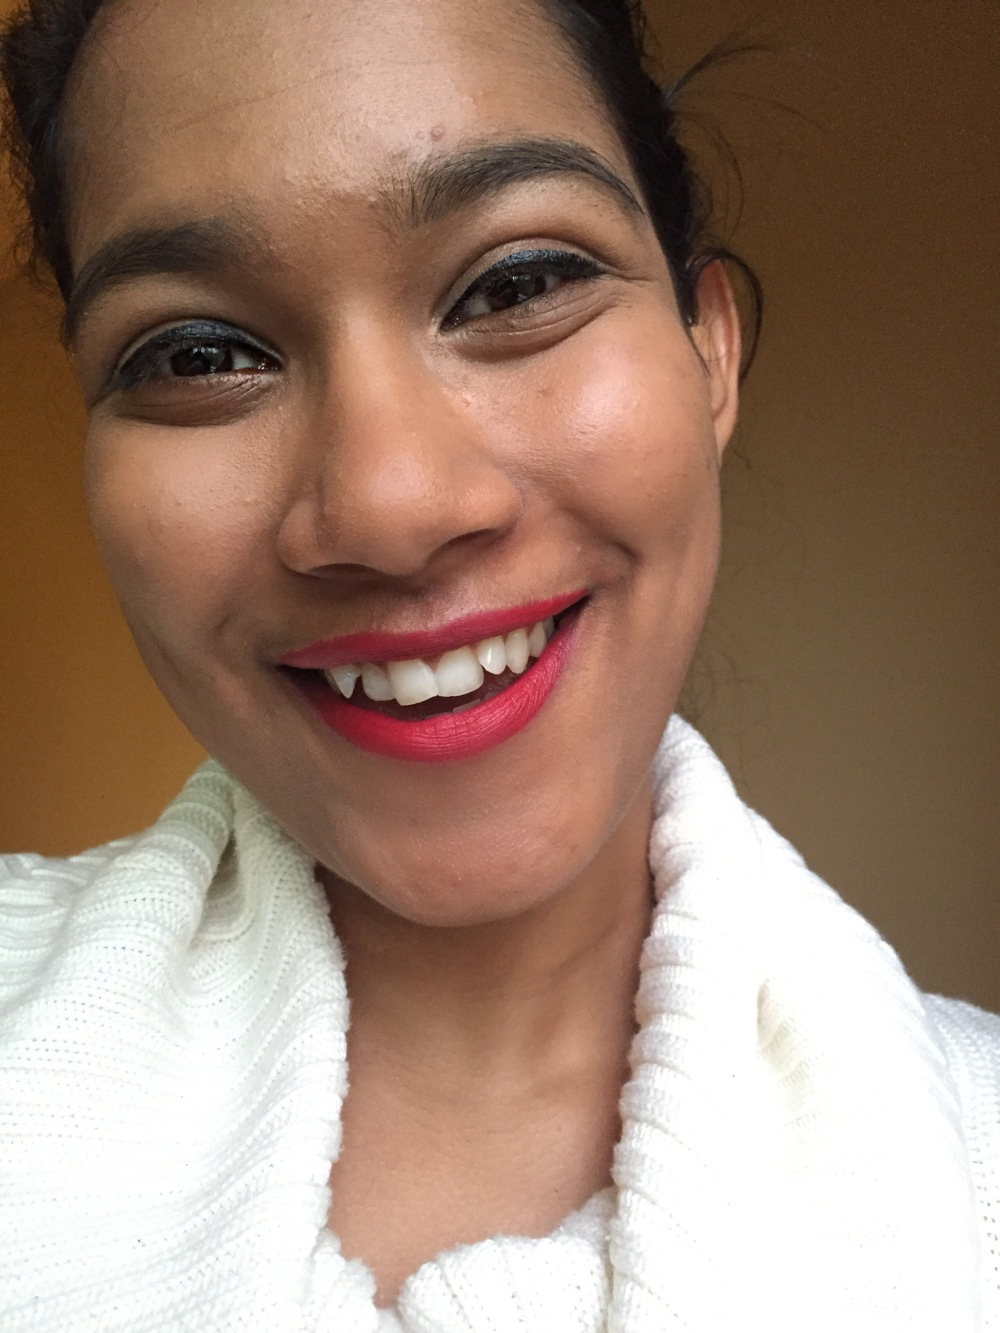 Best Drugstore makeup - Wet N Wild